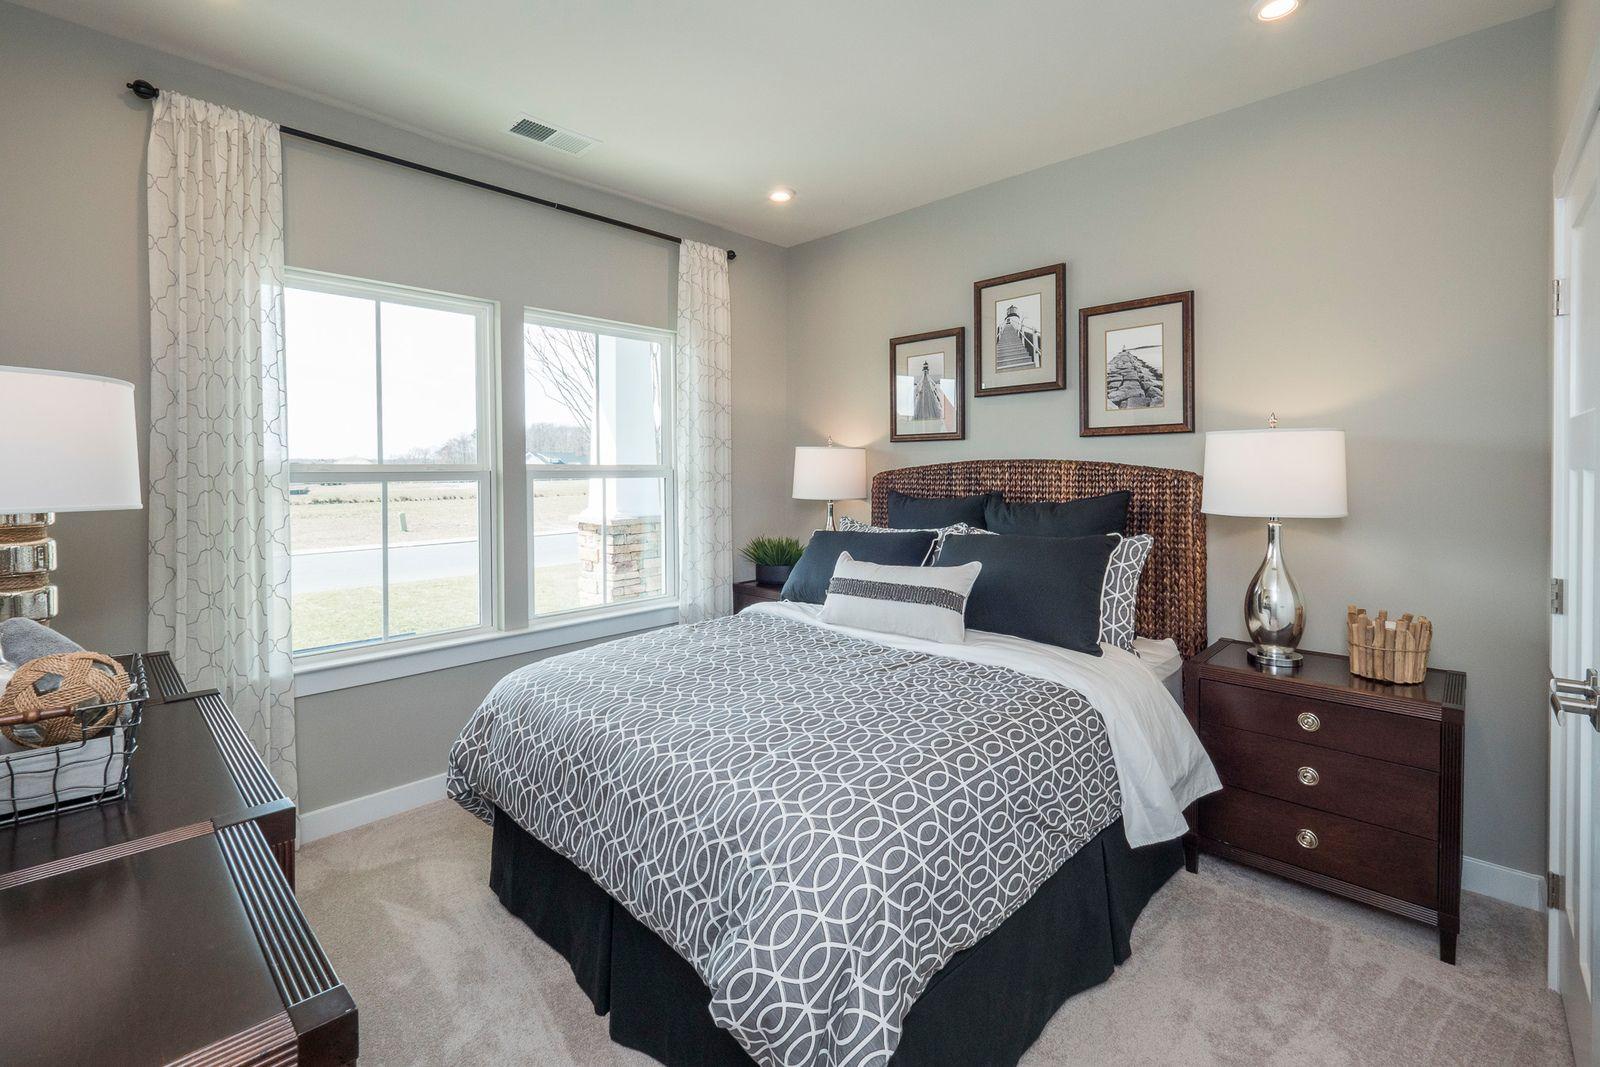 Bedroom featured in the Bramante By Ryan Homes in Warren County, NJ